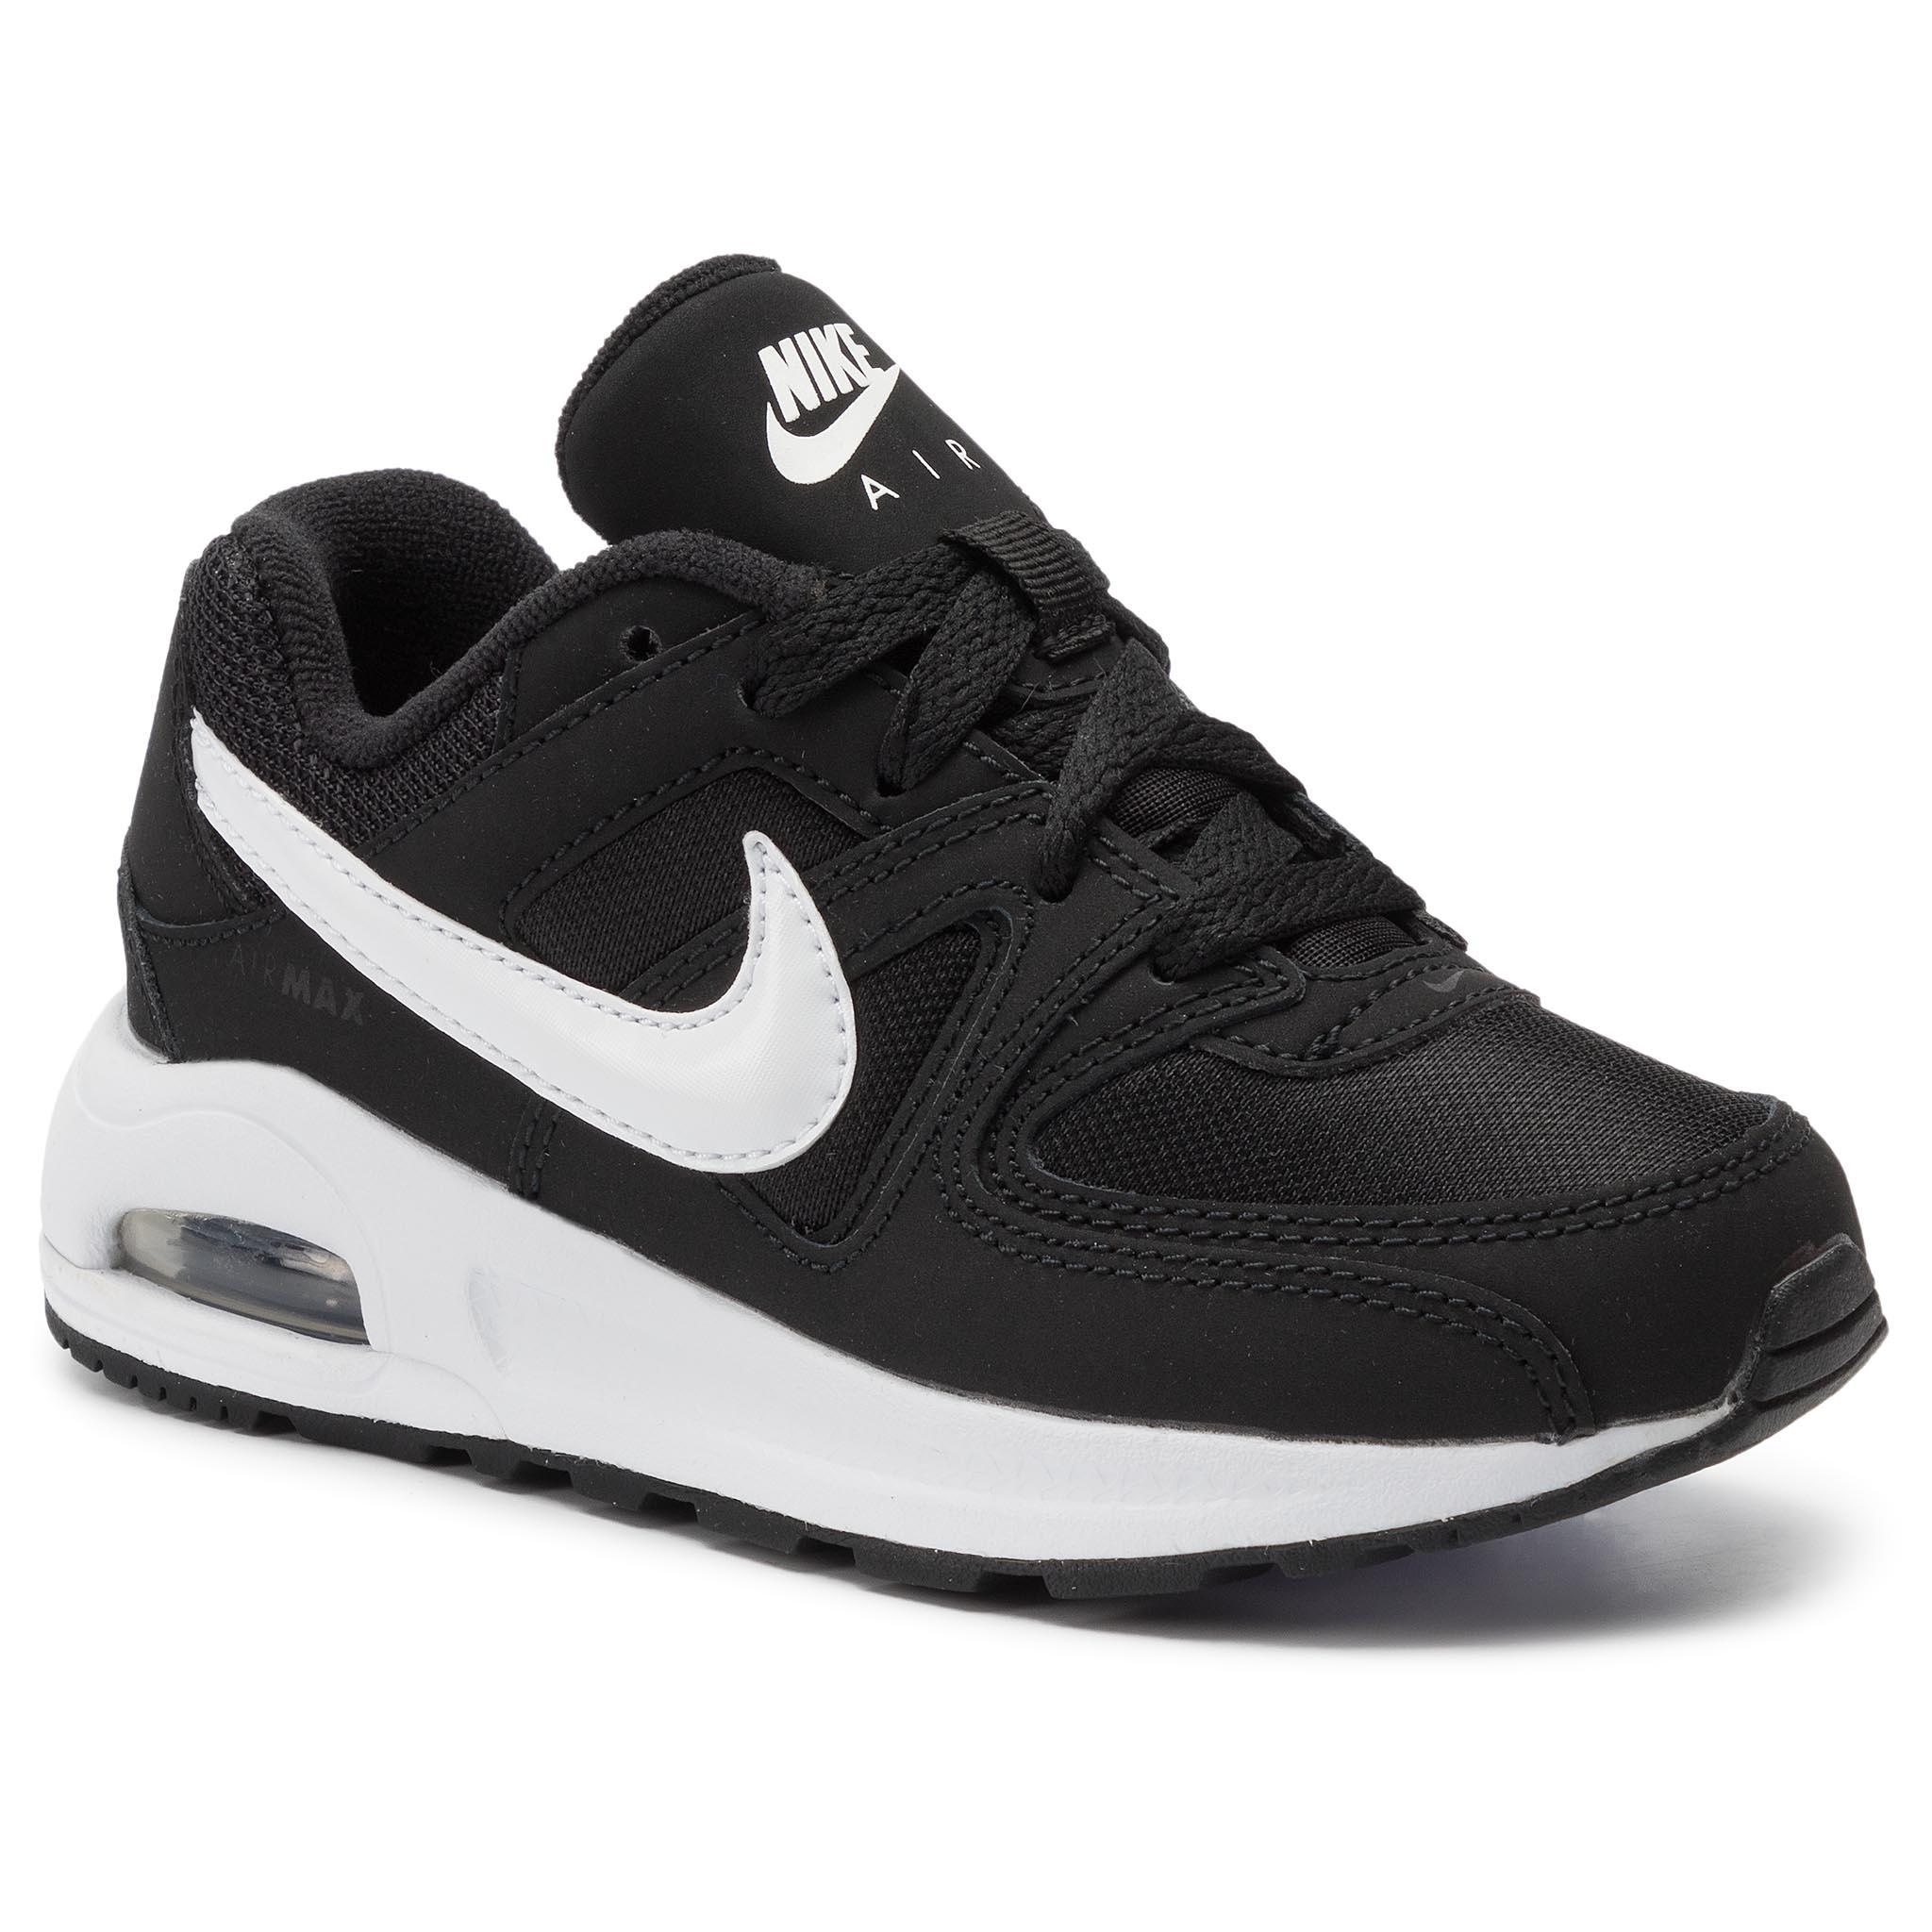 Shoes NIKE Air Max Command Flex (PS) 844347 101 White